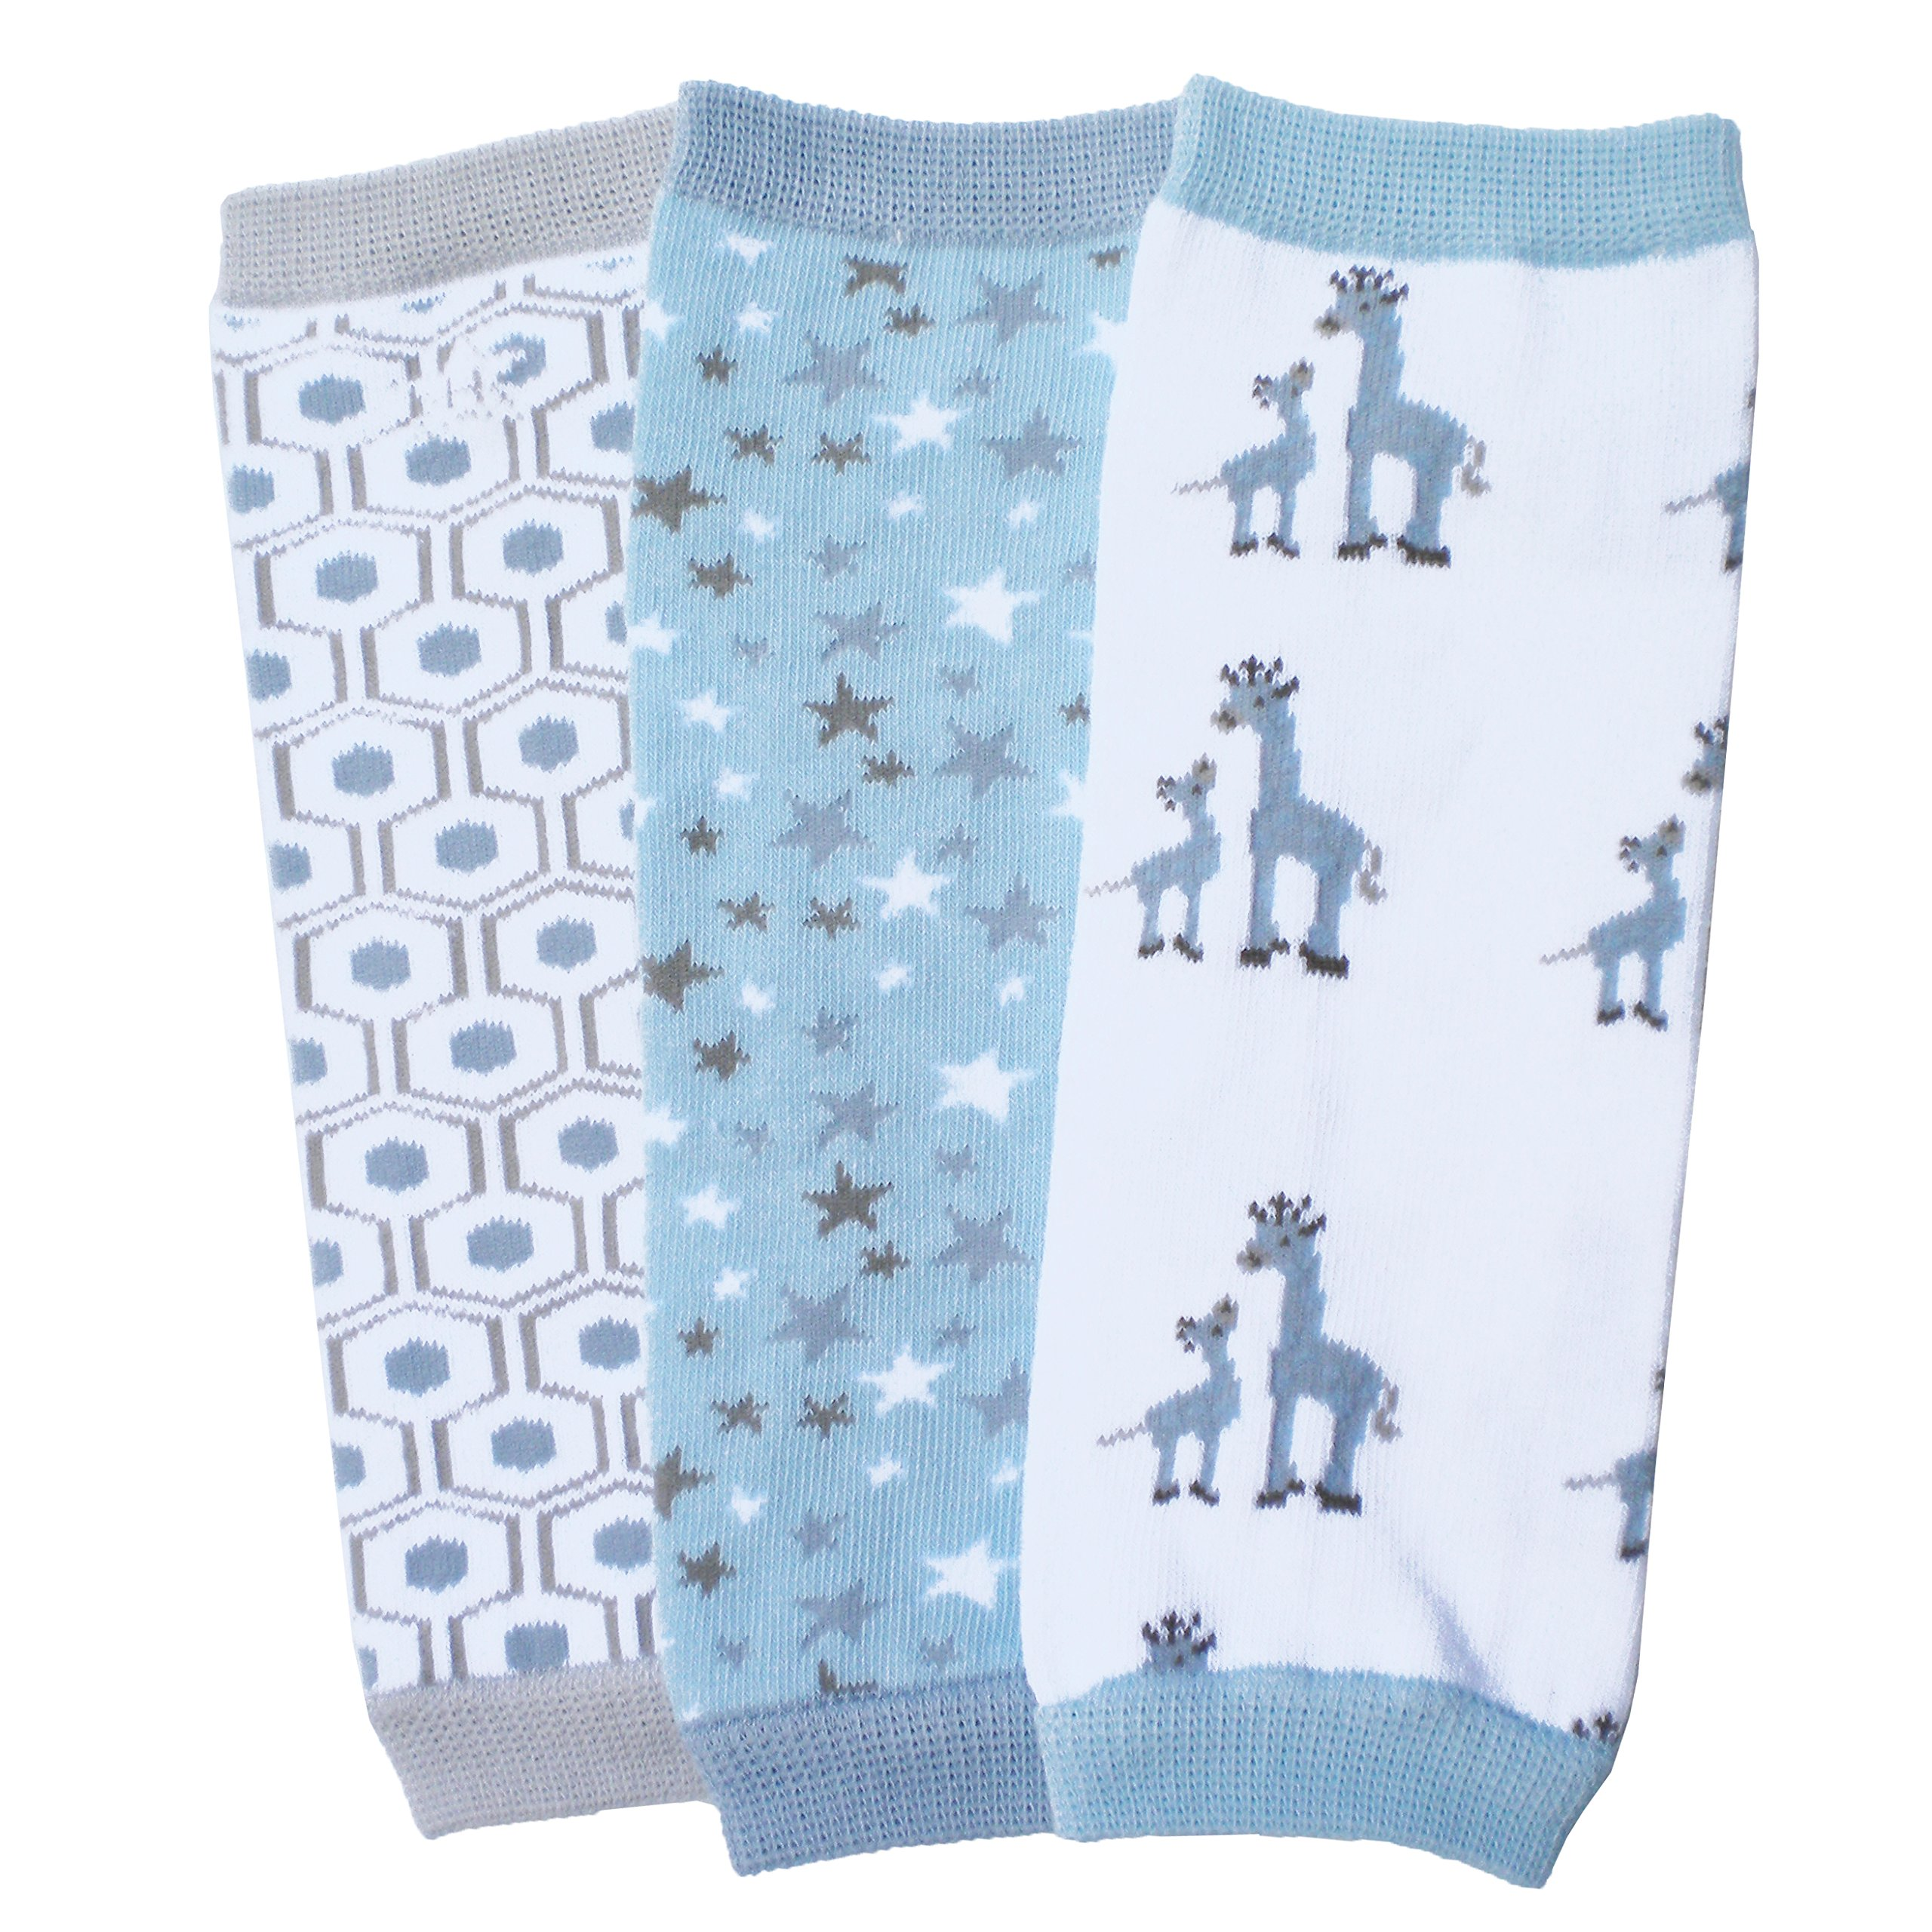 Huggalugs Baby Boy Giraffe Blue Baby Legwarmer Set,Baby (fits newborn up to 6 months) by Huggalugs